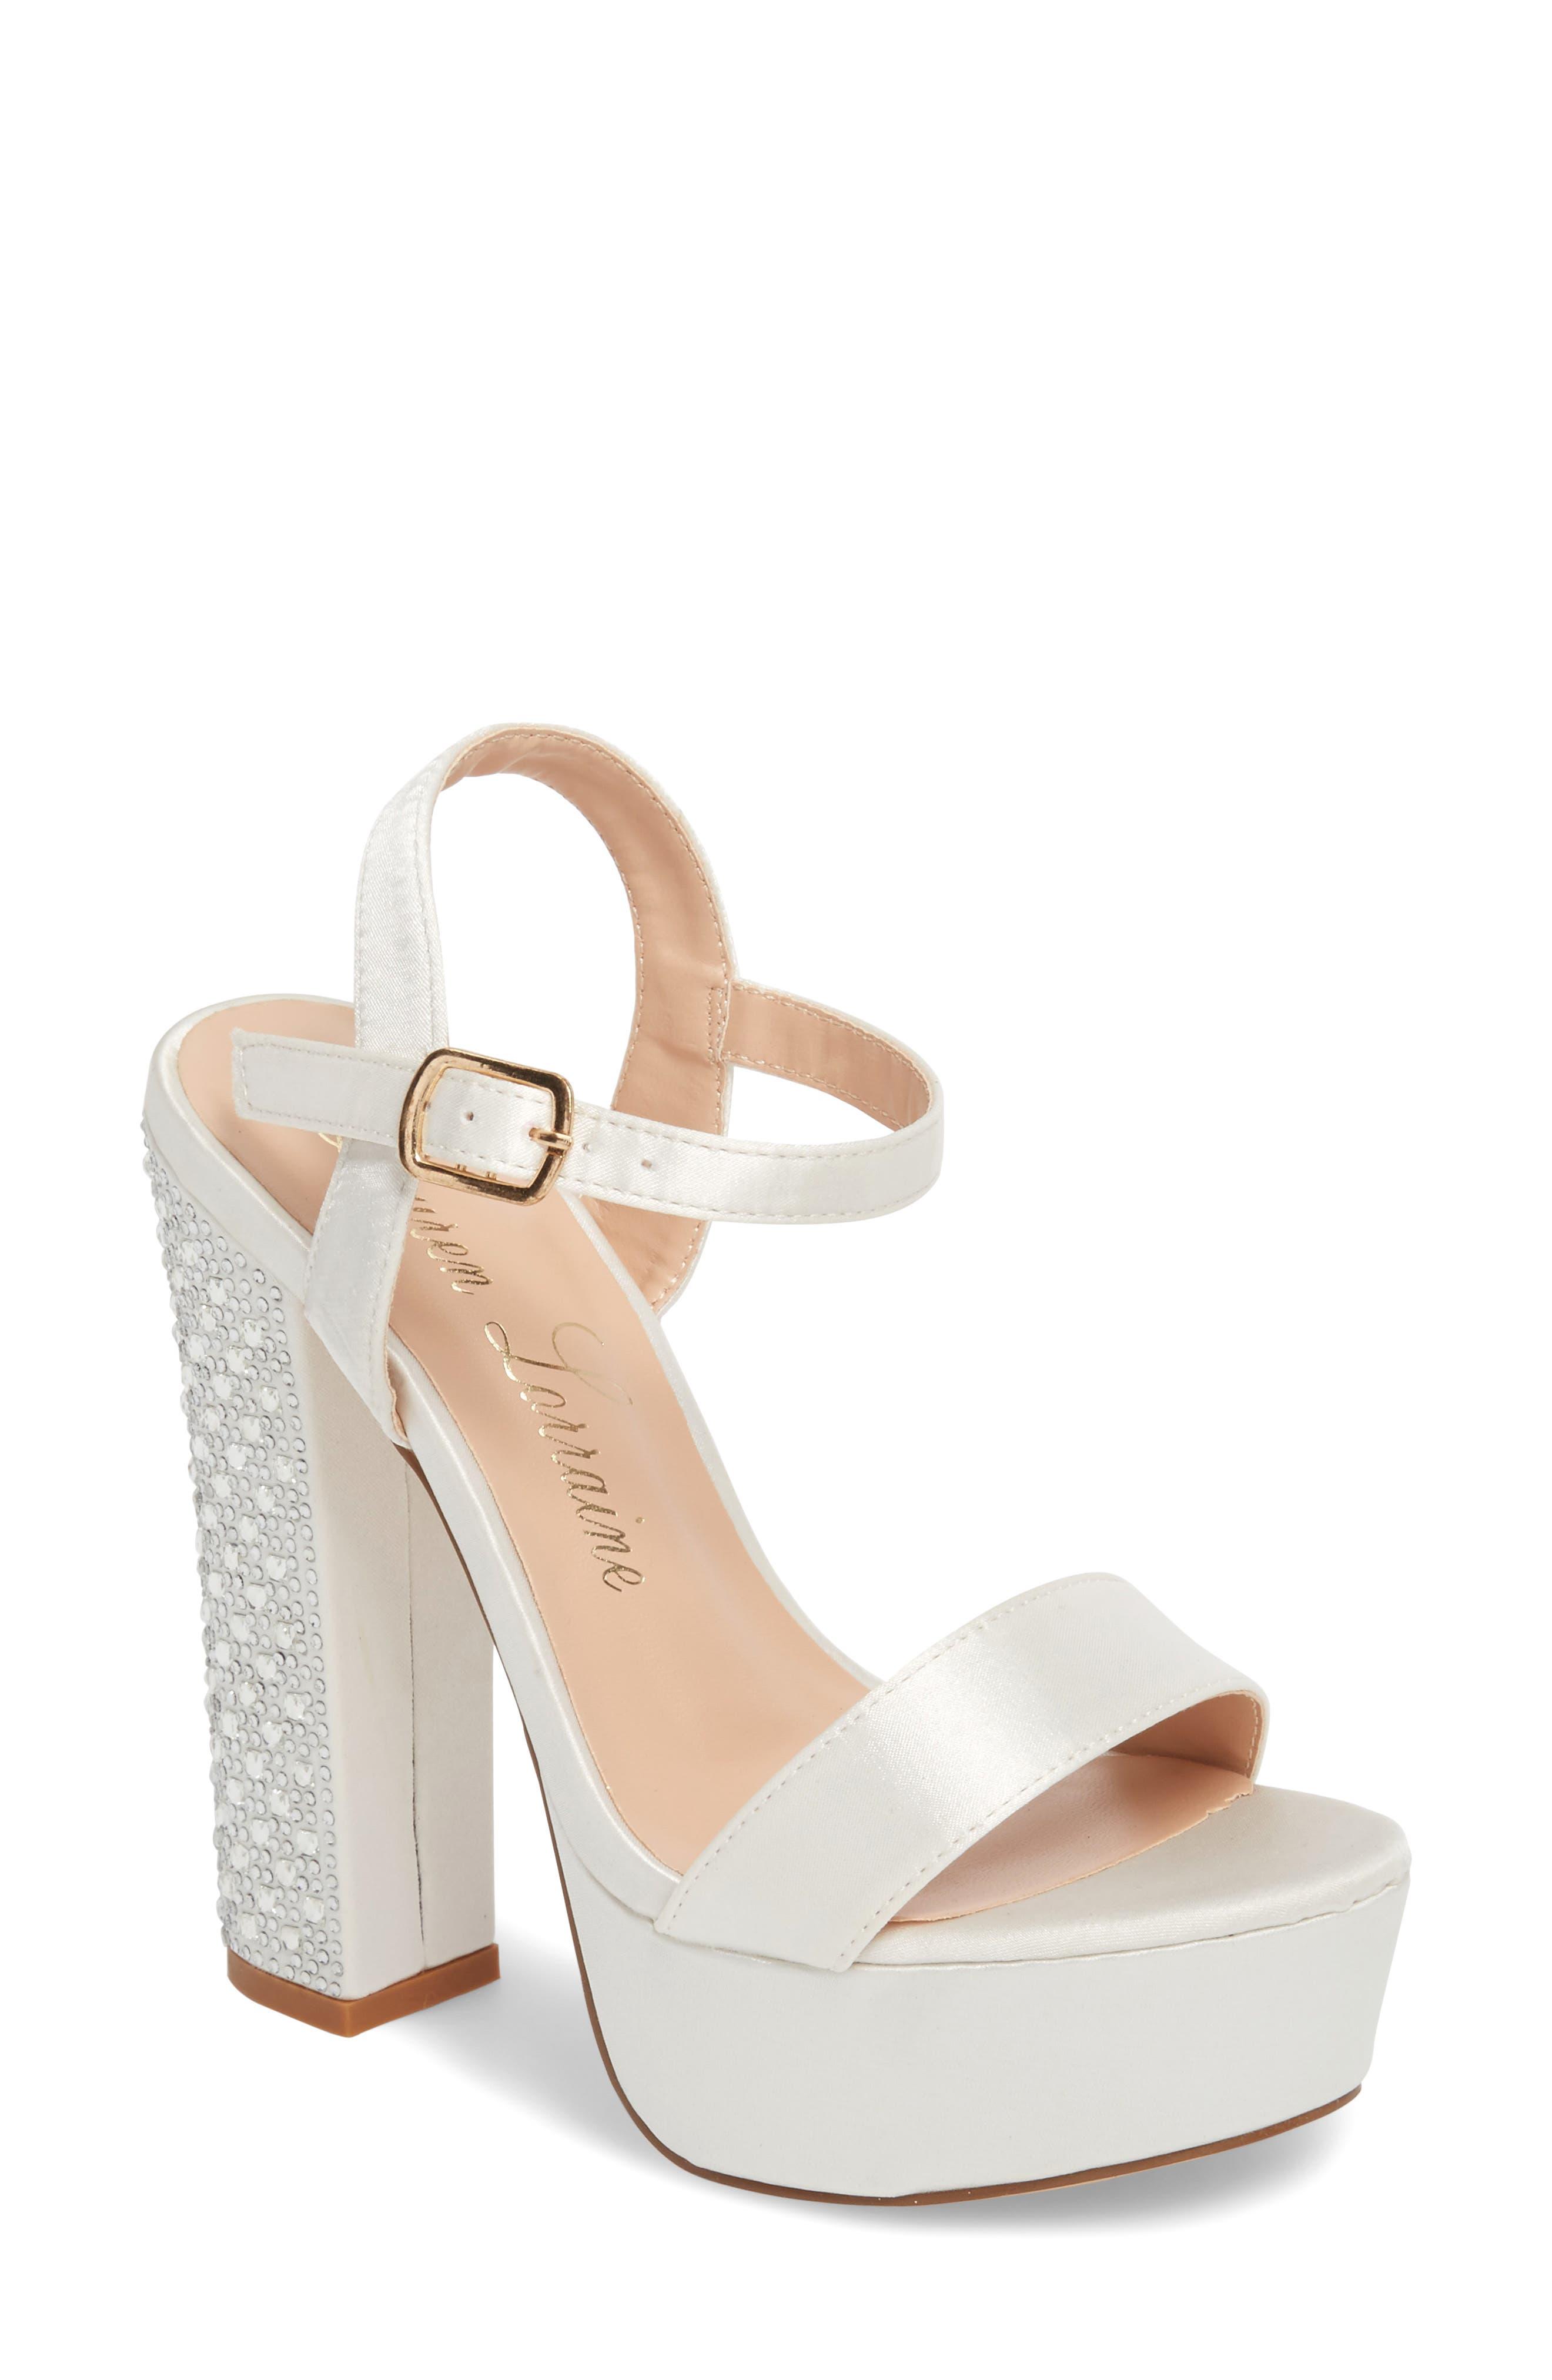 Lauren Lorraine Carly Platform Sandal- Ivory